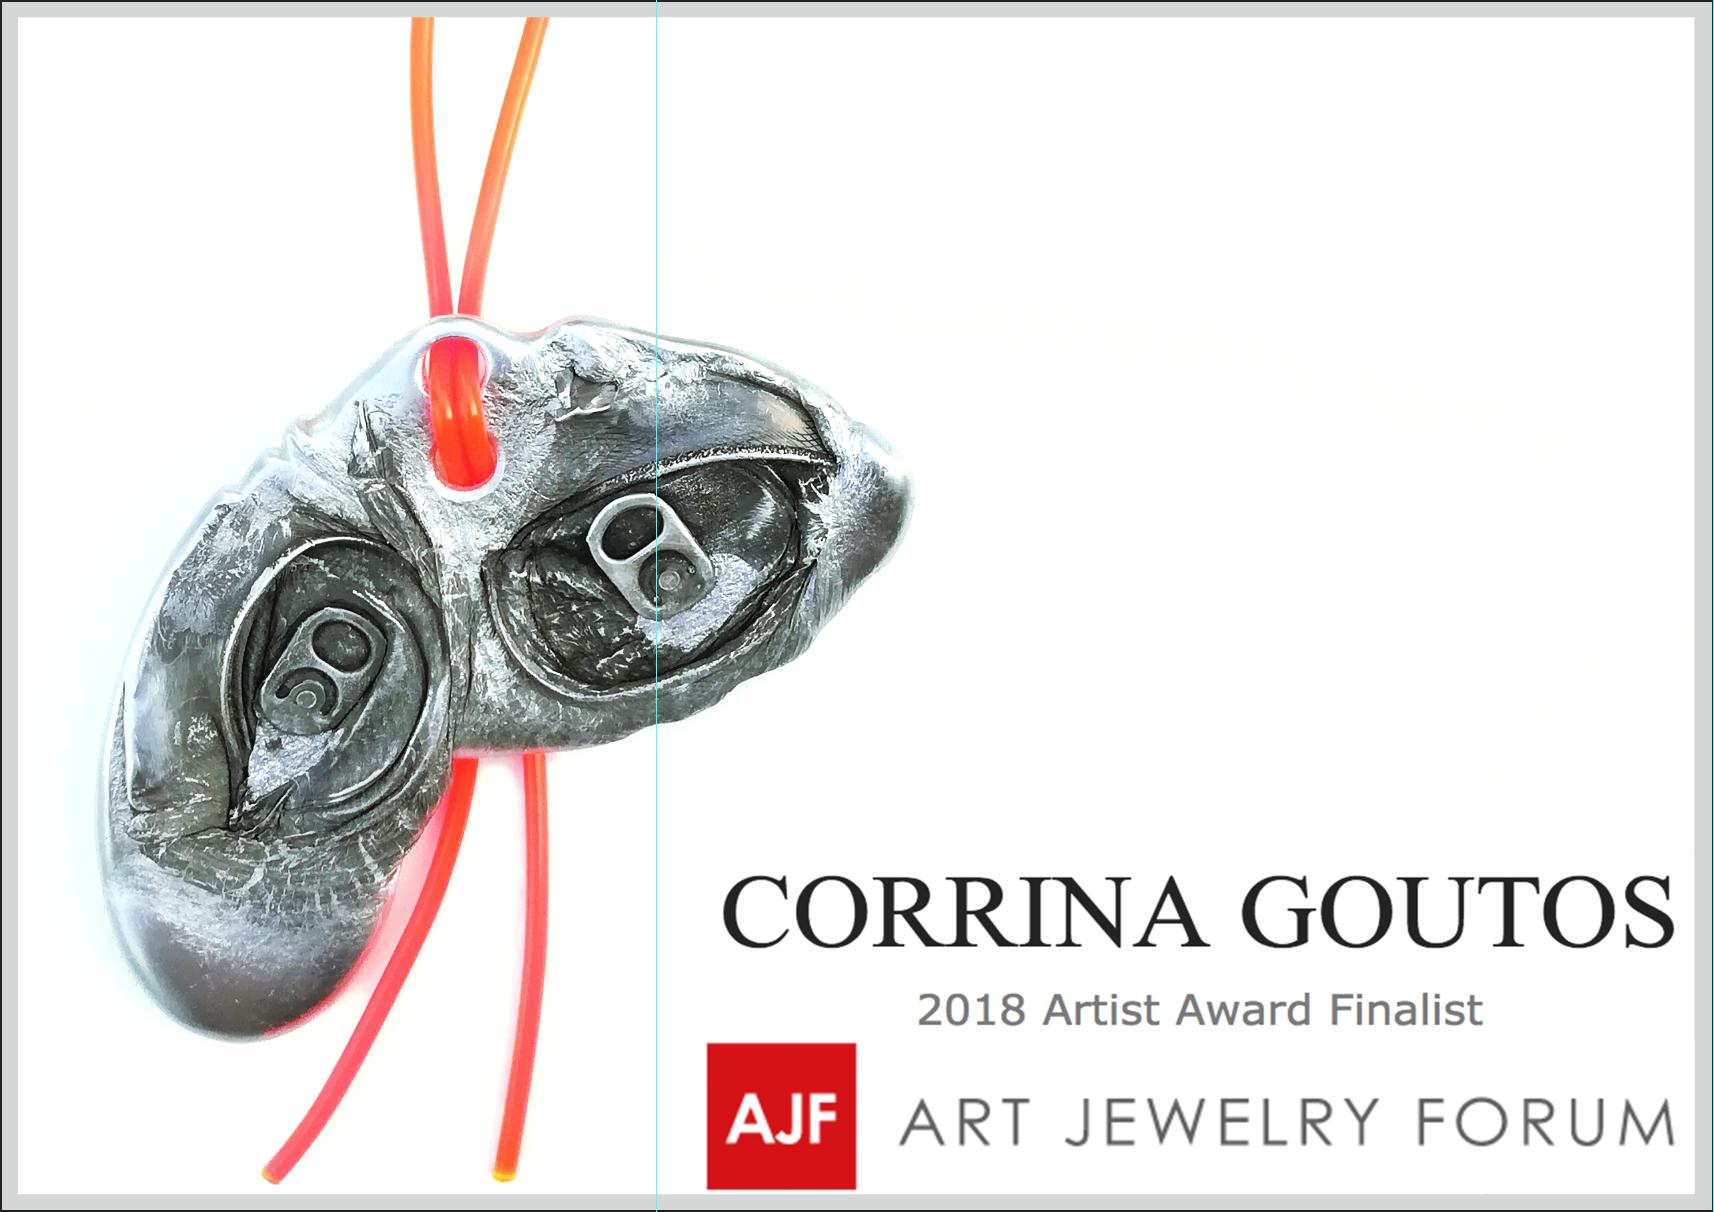 Art Jewelry Forum Award Finalist Interveiw - read the interview here